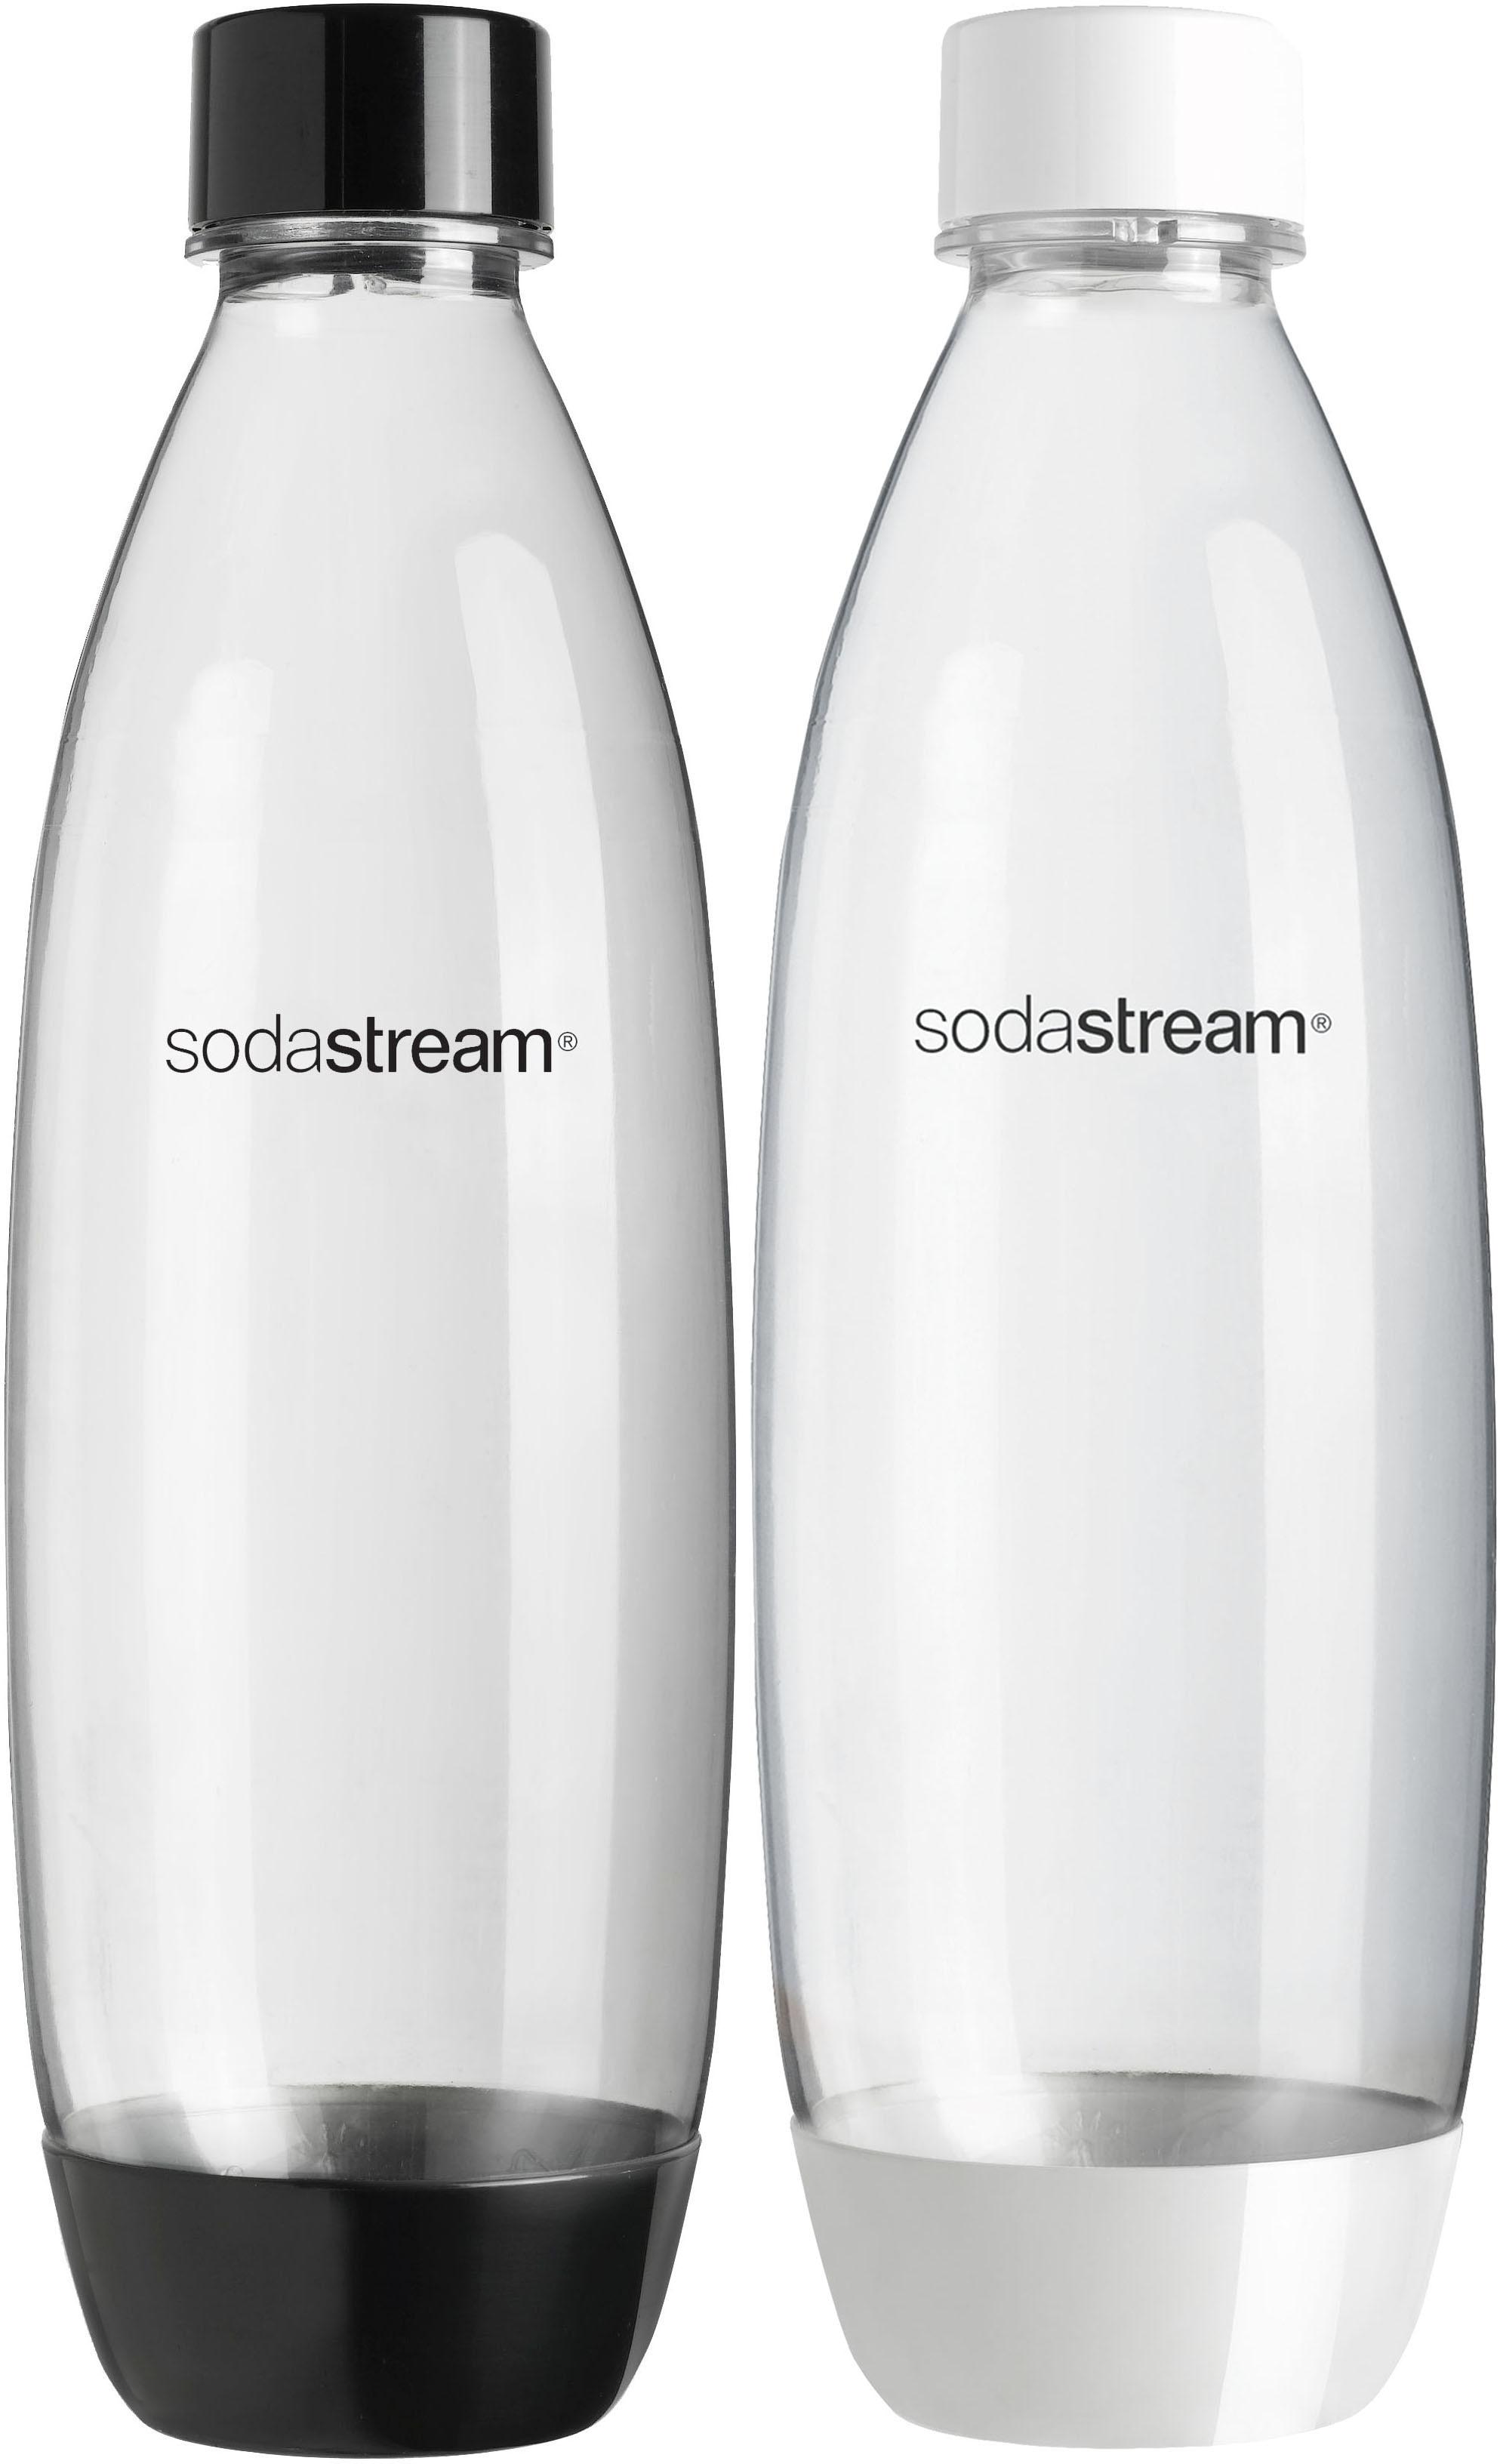 SodaStream Wasserkaraffe (2-tlg) Technik & Freizeit/Elektrogeräte/Haushaltsgeräte/Küchenkleingeräte/Sodastream